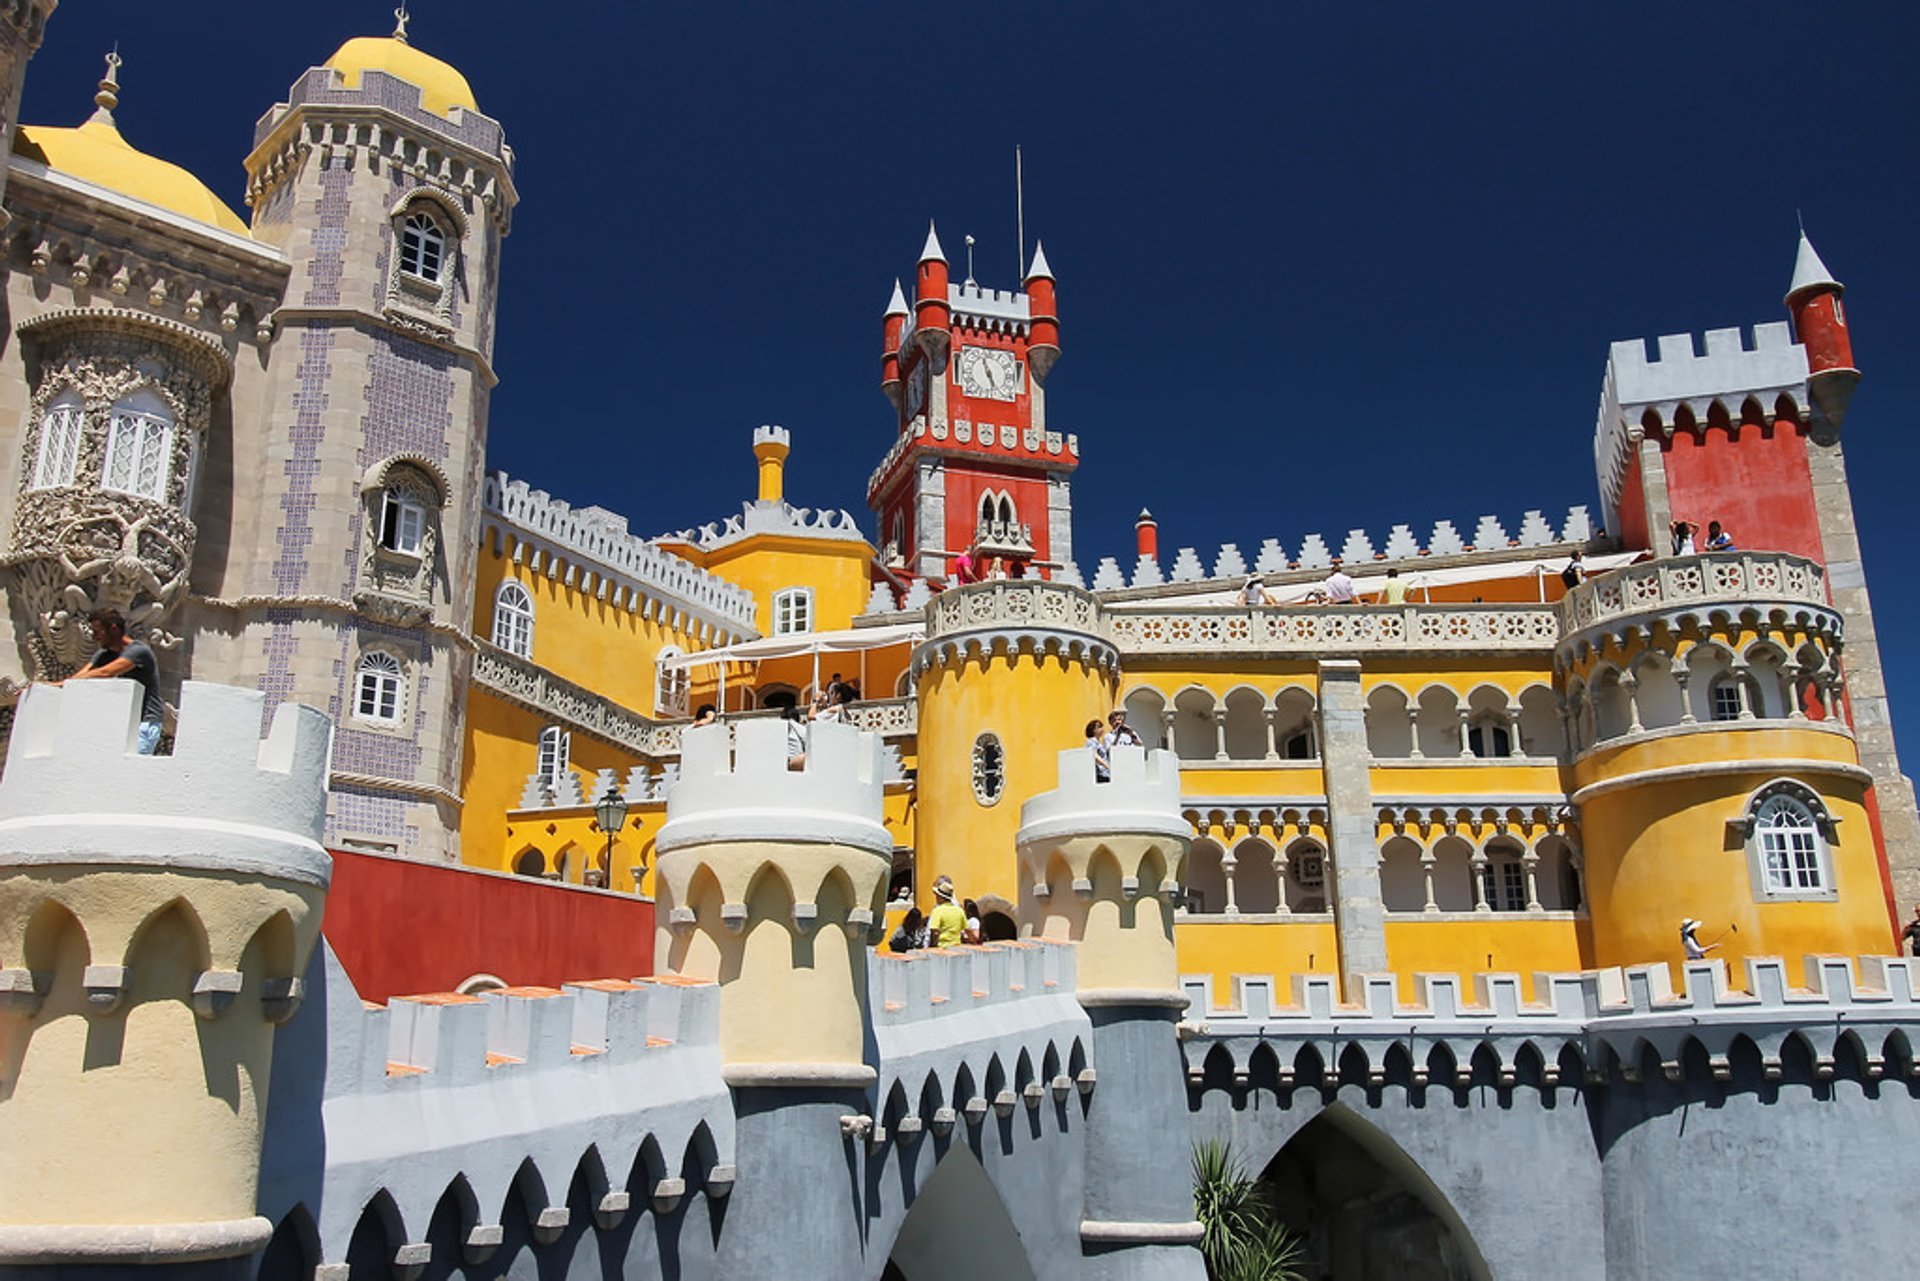 Pena Palace 2019